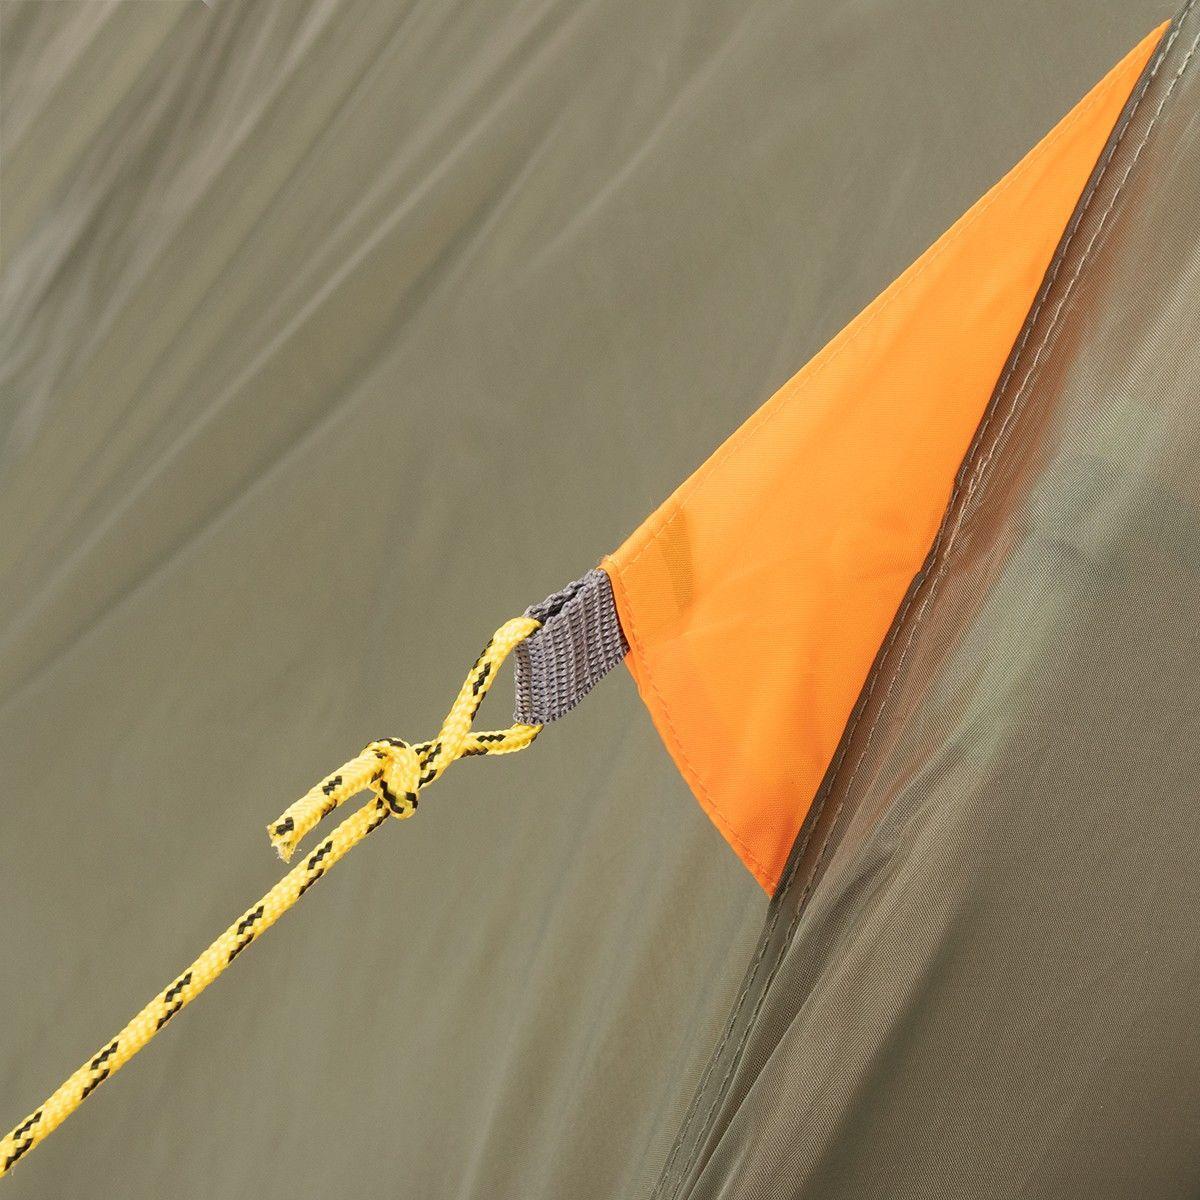 Палатка MUSSON-4 Helios зеленый-оранжевый HS-2366-4 GO - фото 10